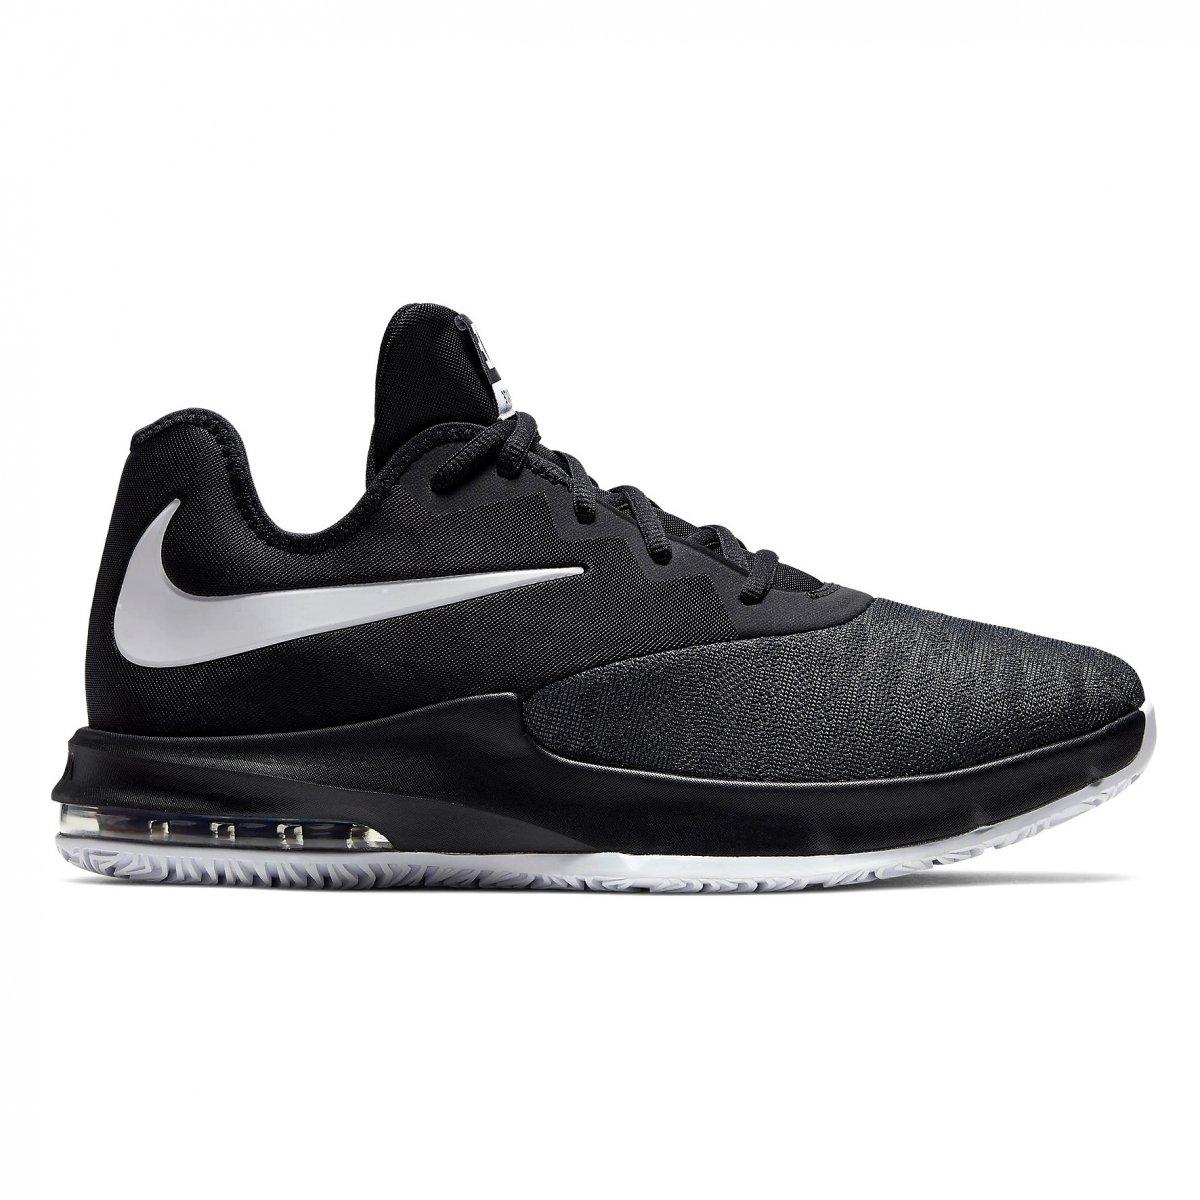 9b2848139a388 Amplie a imagem. Tênis Masculino Nike Air Max Infuriate 3 Low; Tênis  Masculino Nike Air Max Infuriate ...